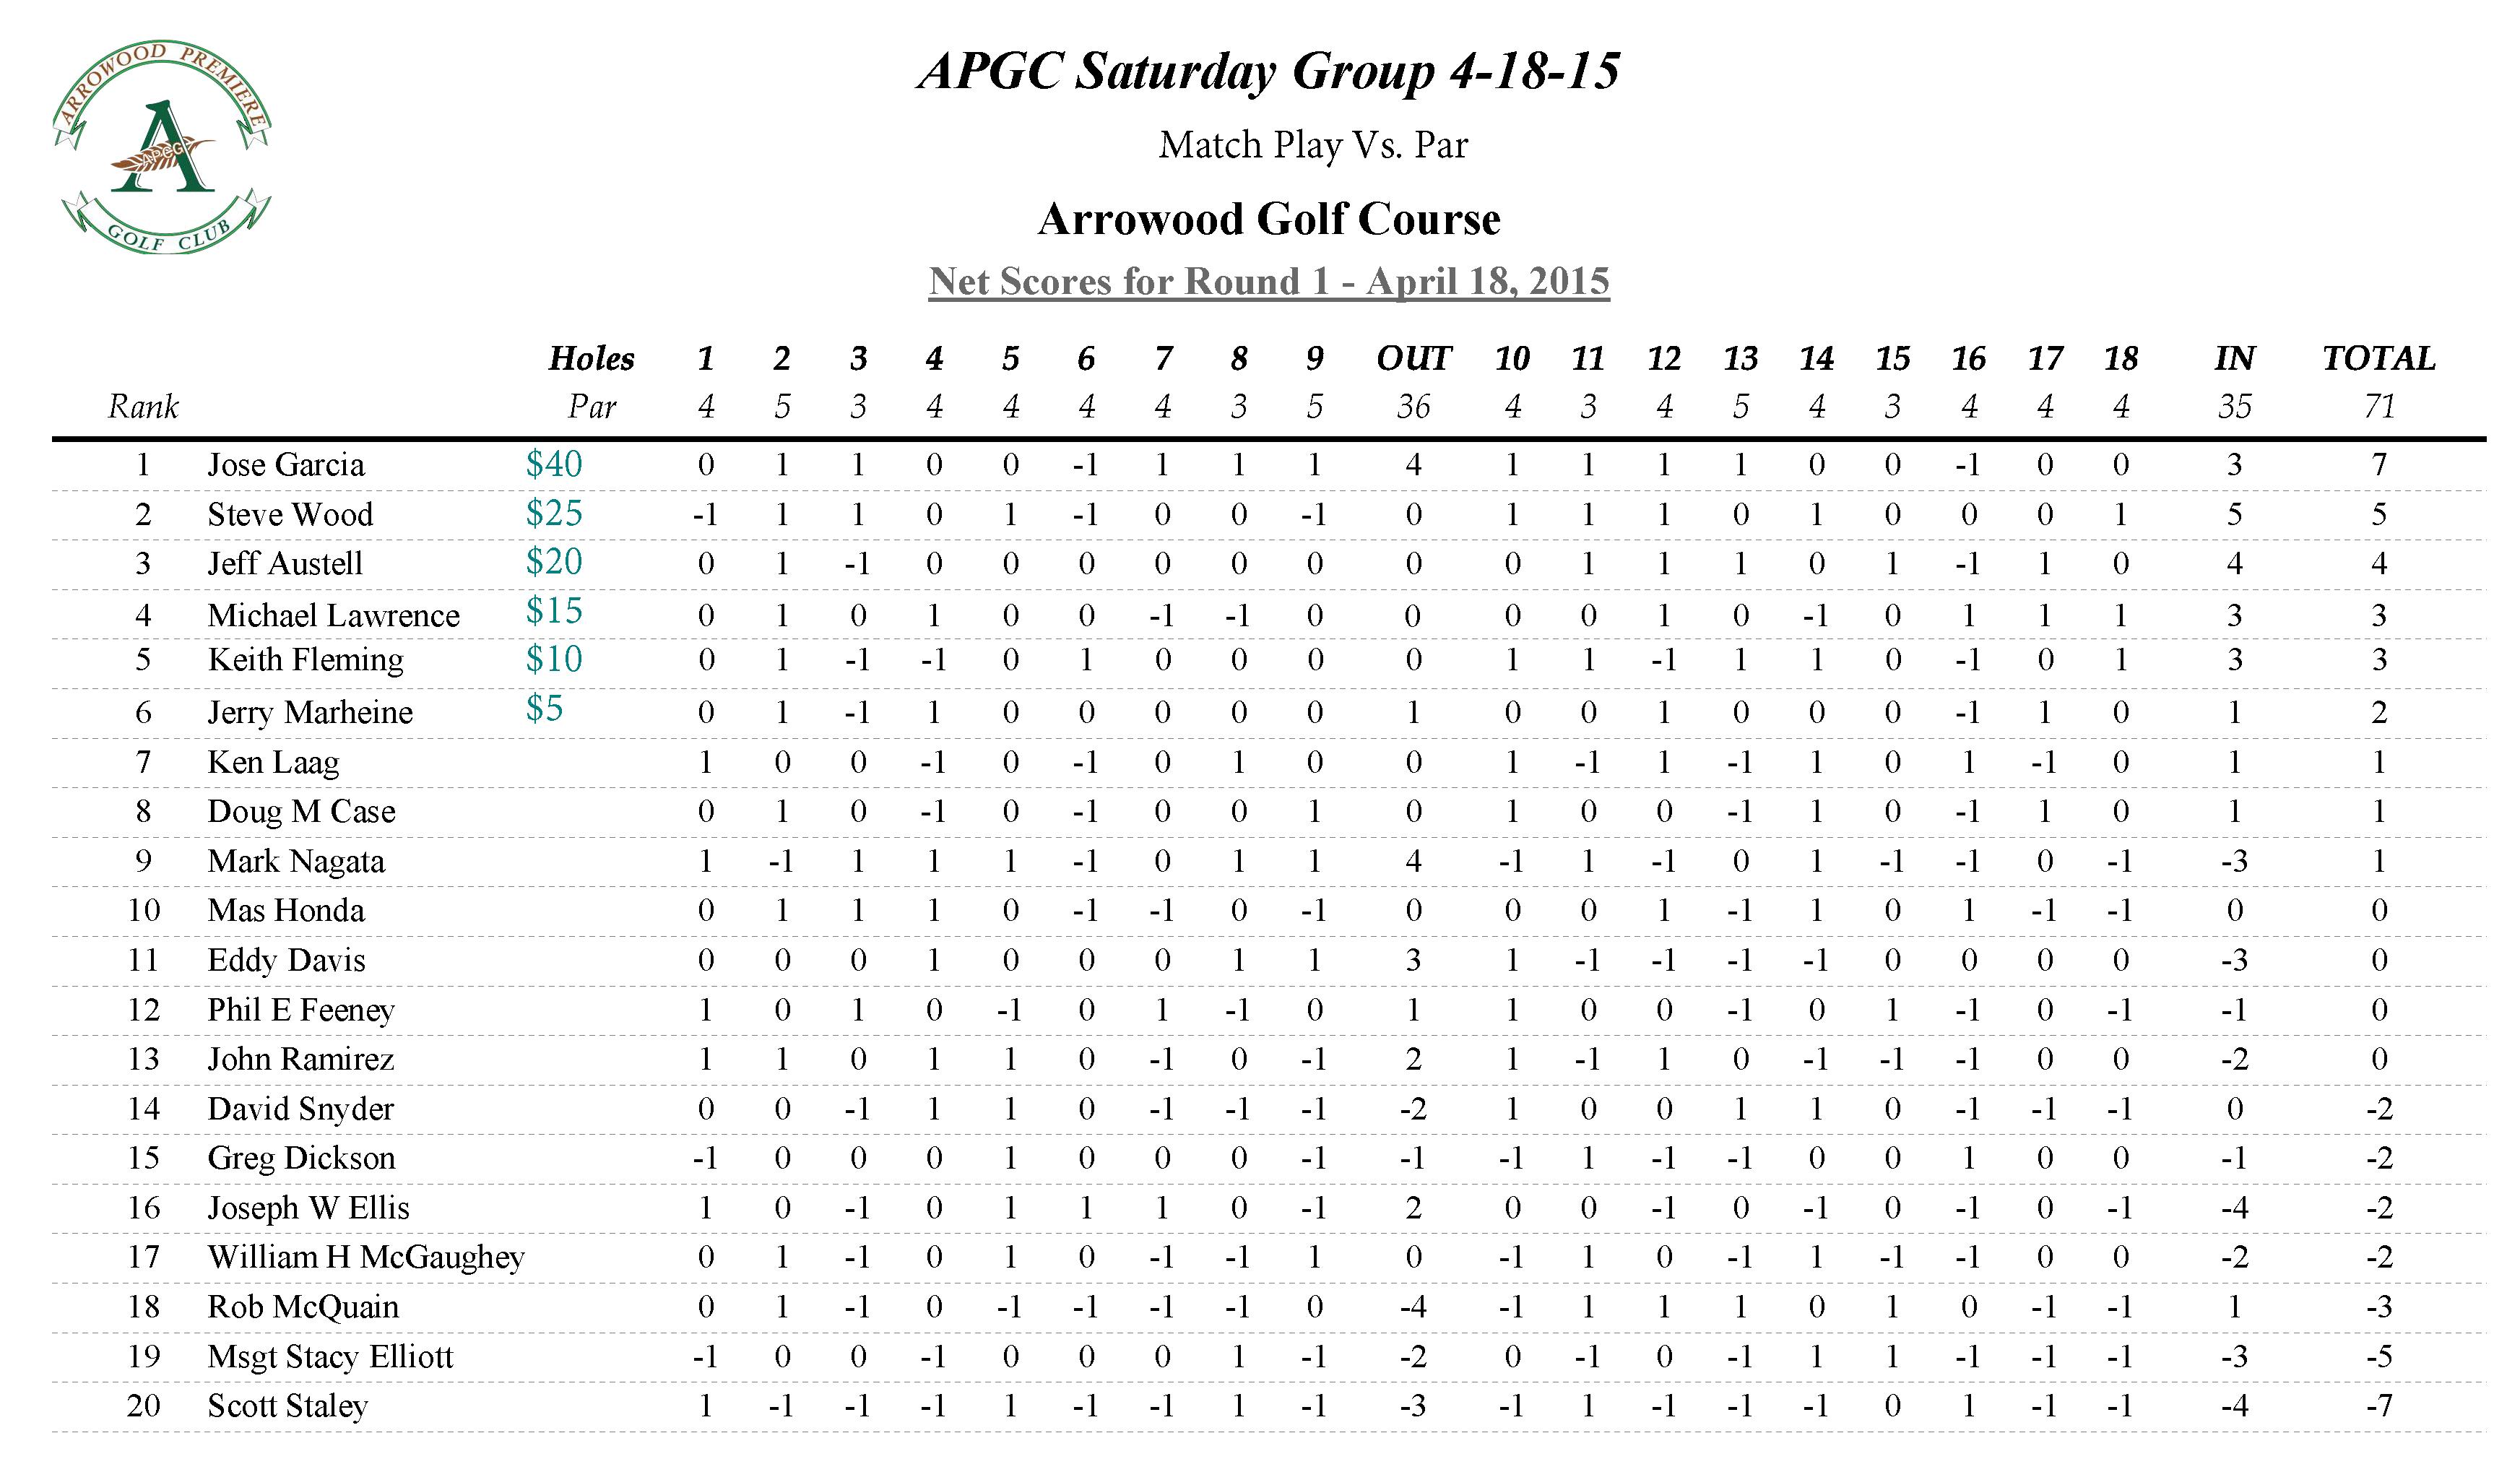 APGC Saturday 4-18-15